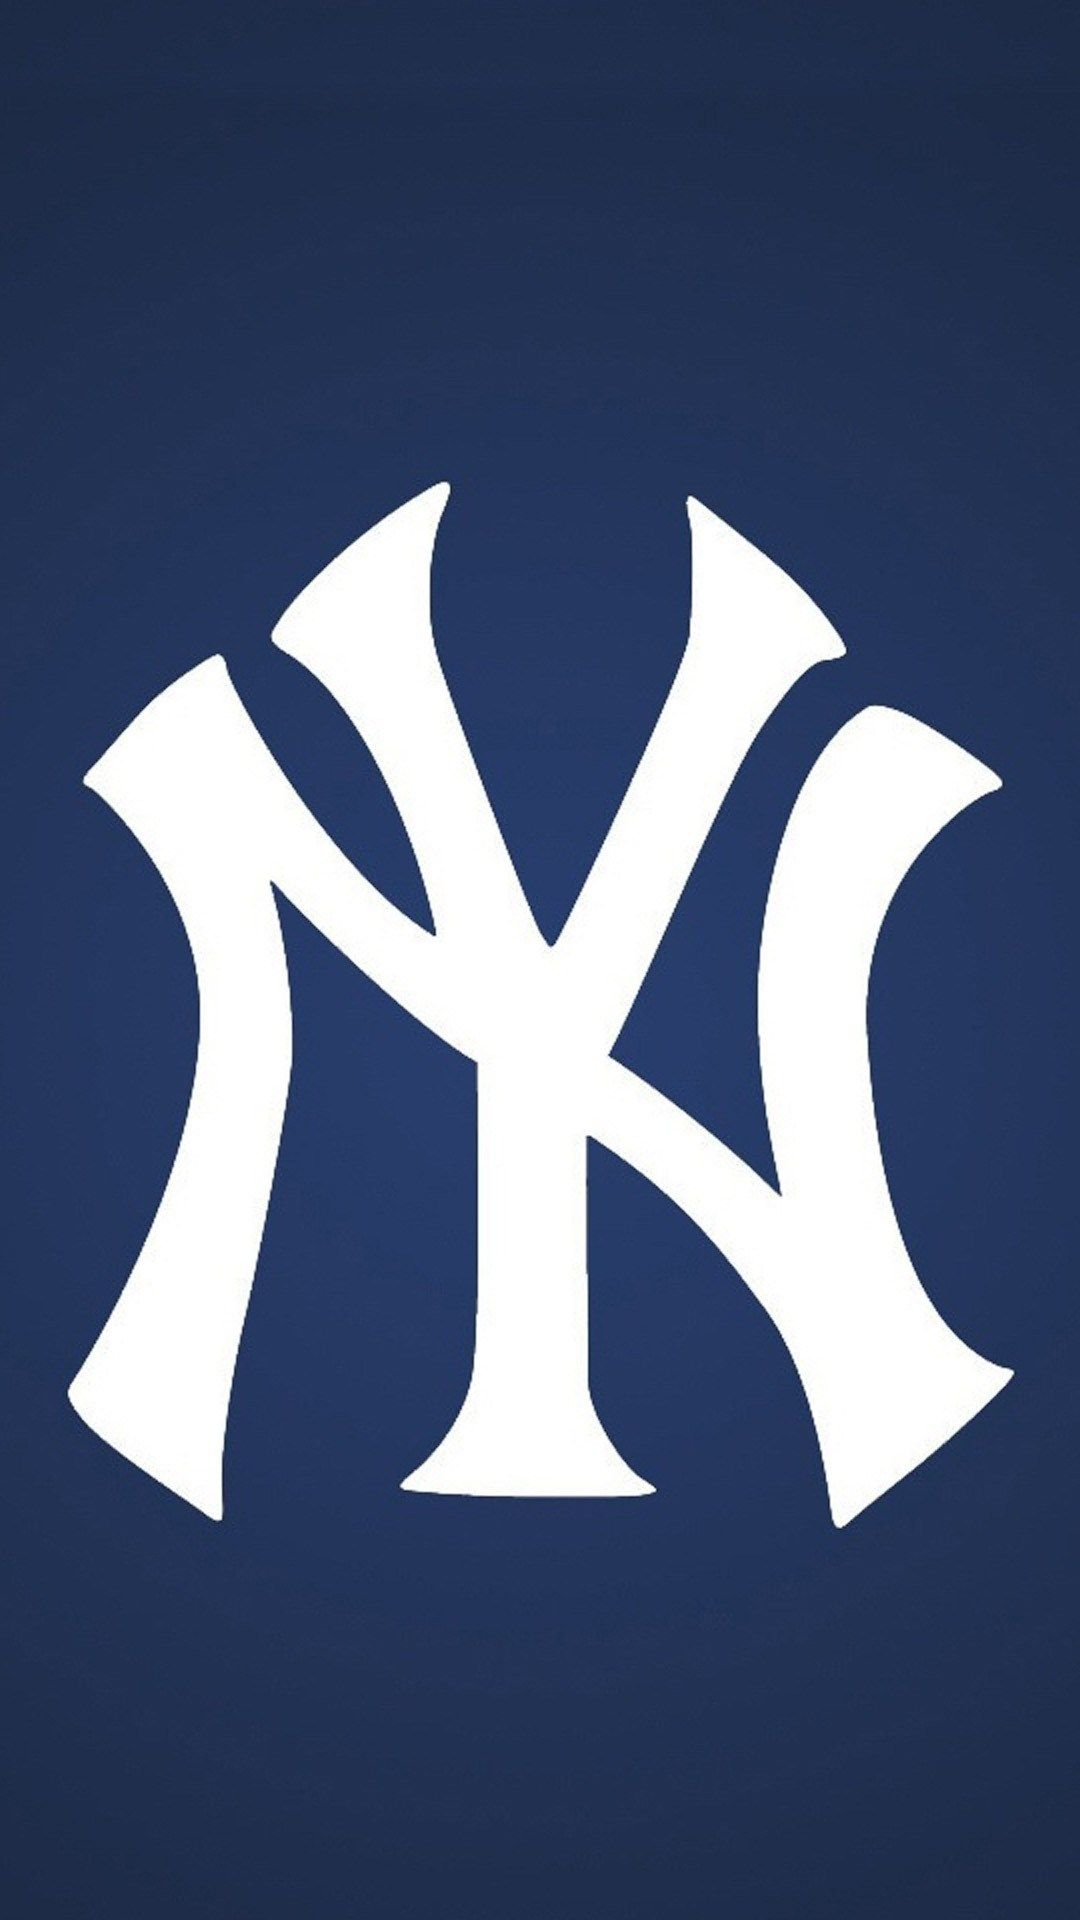 Yankee Wallpapers Group 65 New york yankees, Yankees